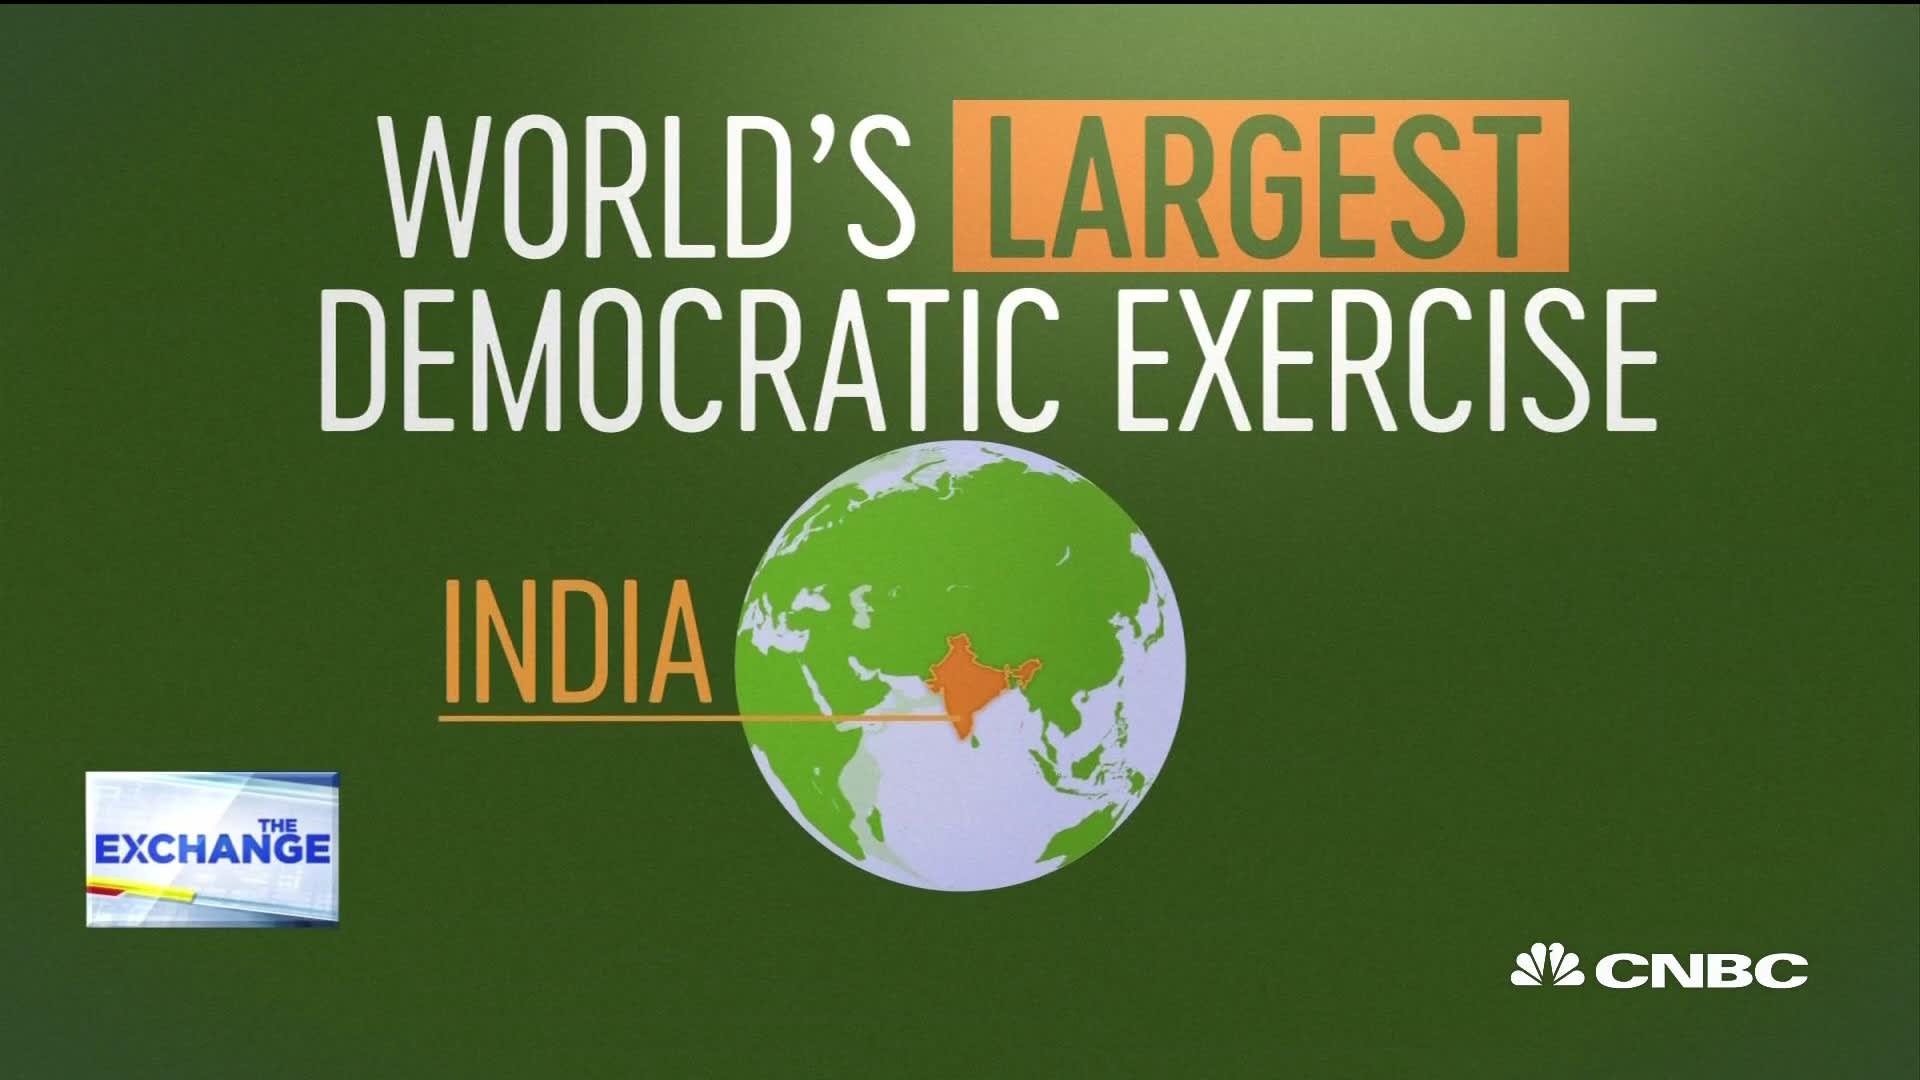 900 million eligible voters make India's election world's largest  democratic exercise